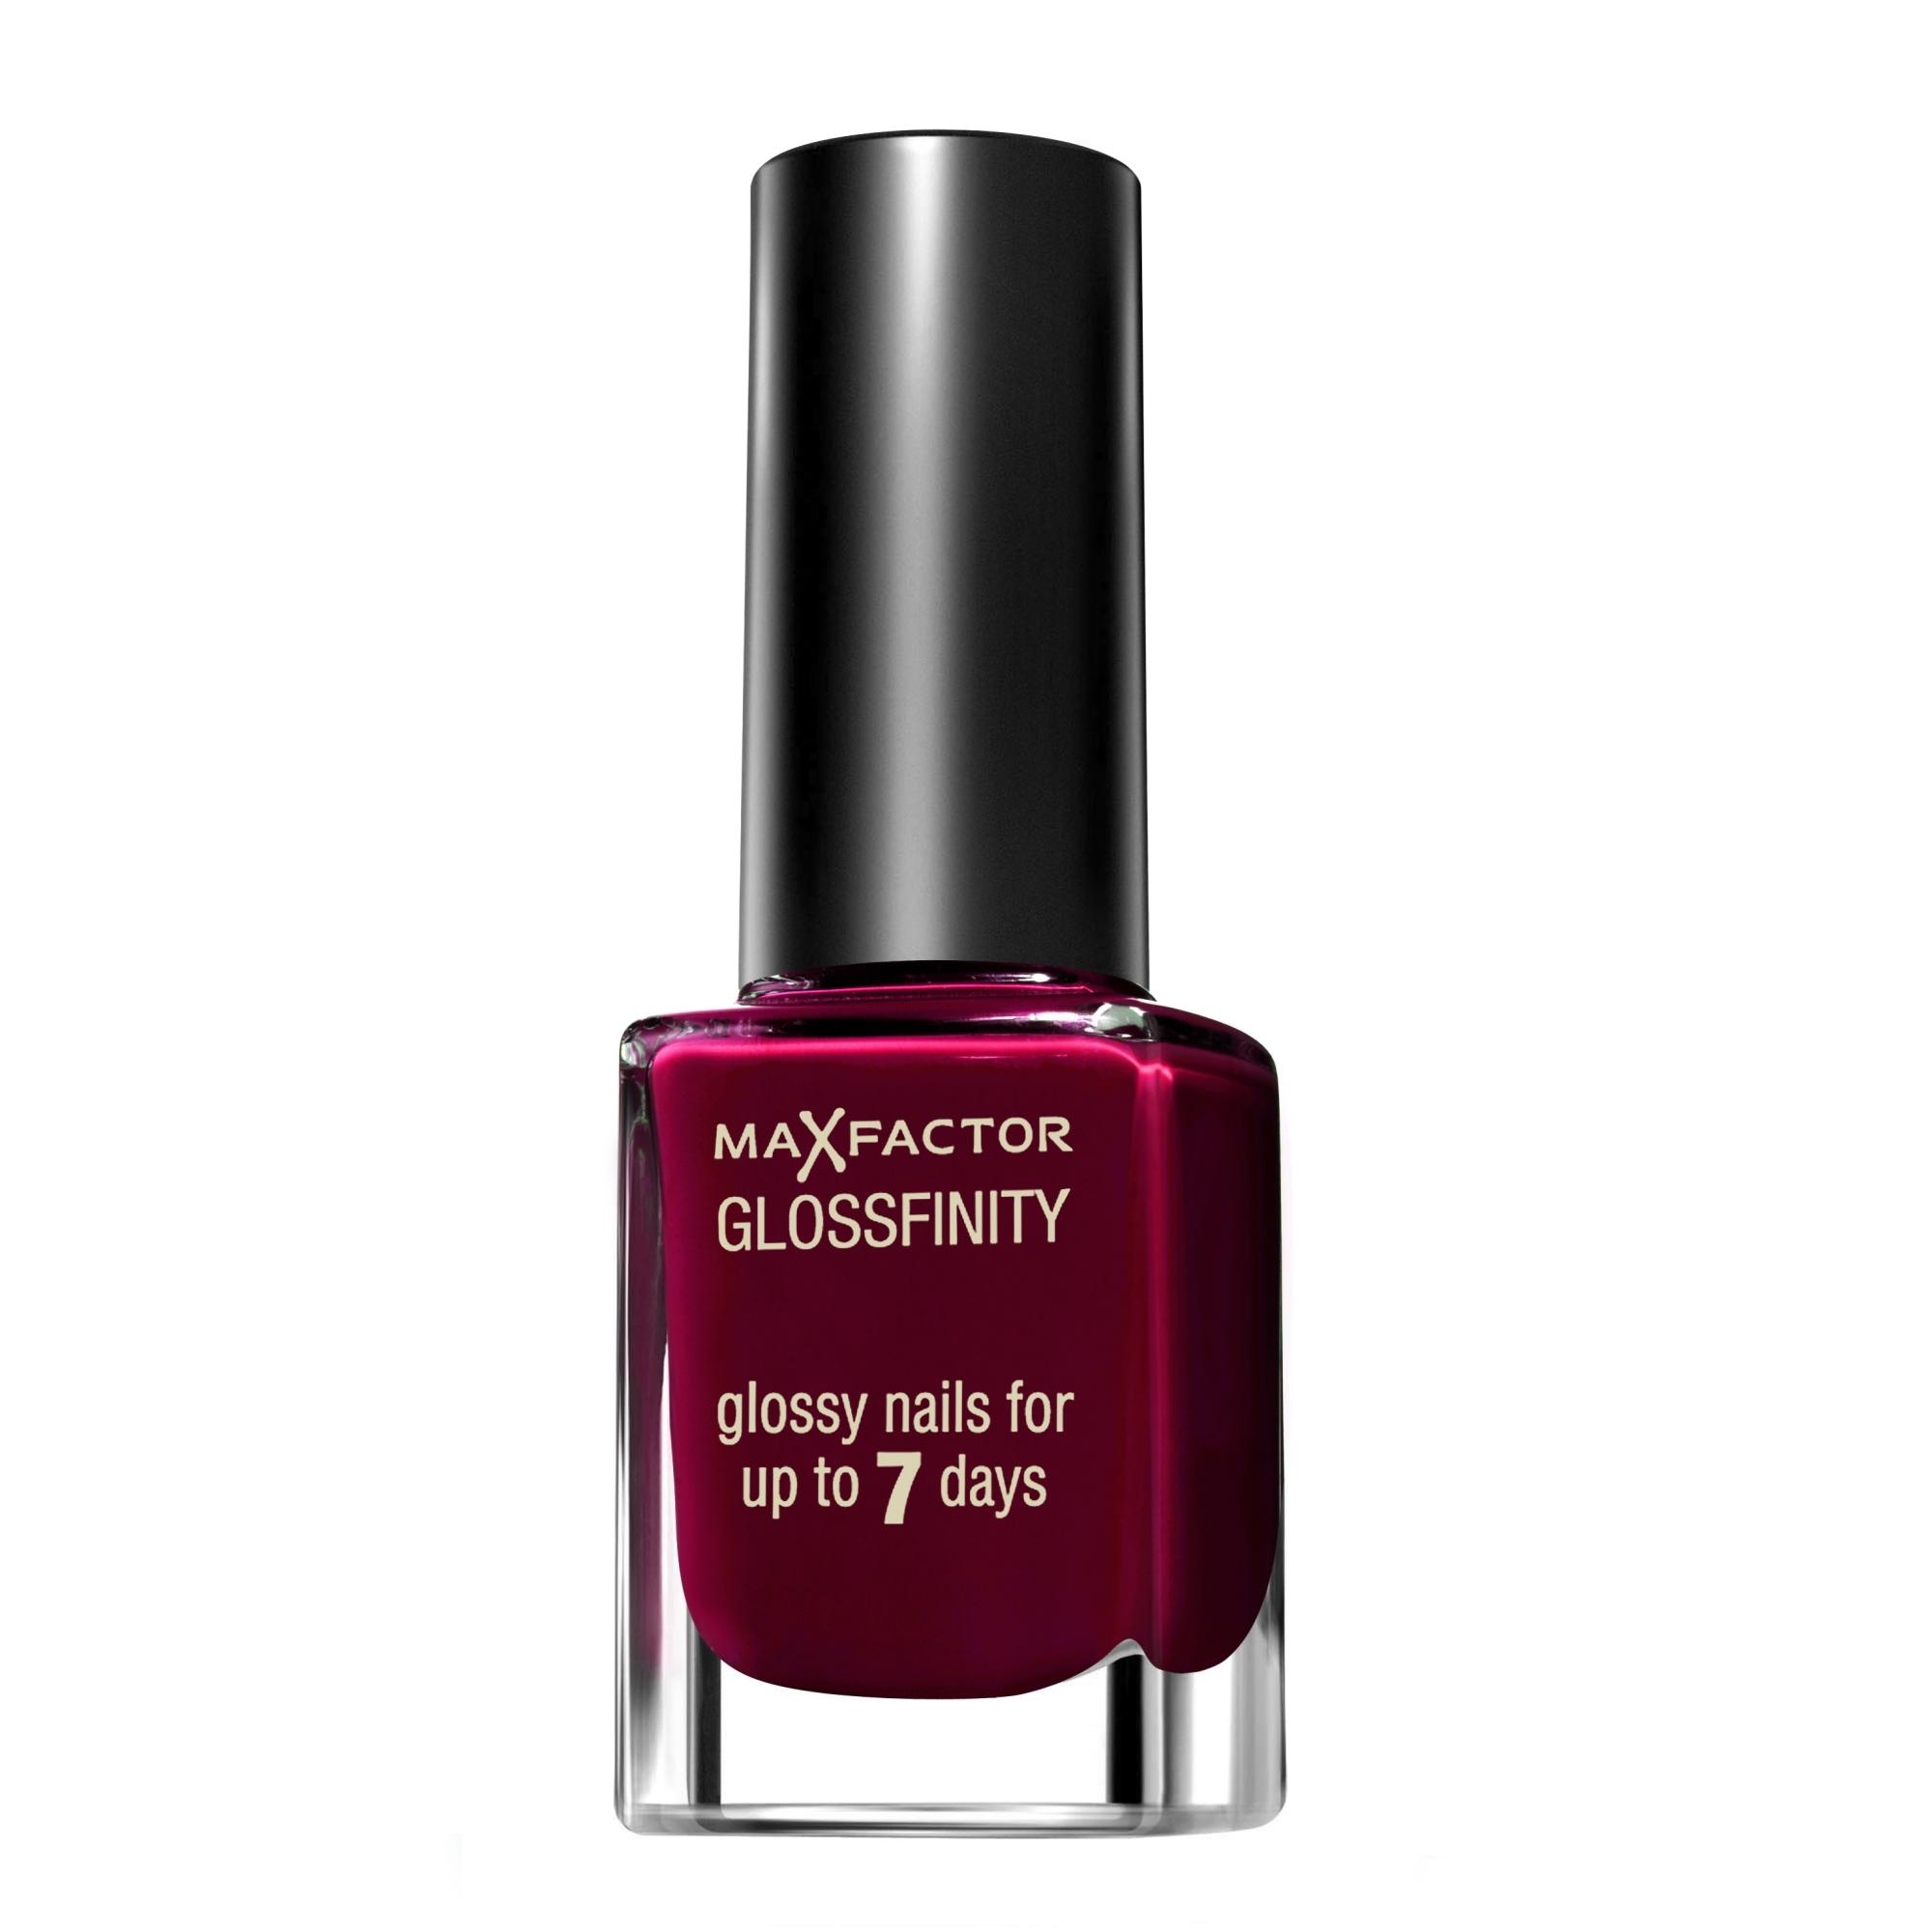 Glossfinity Nail Polish 155 Burgundy Crush